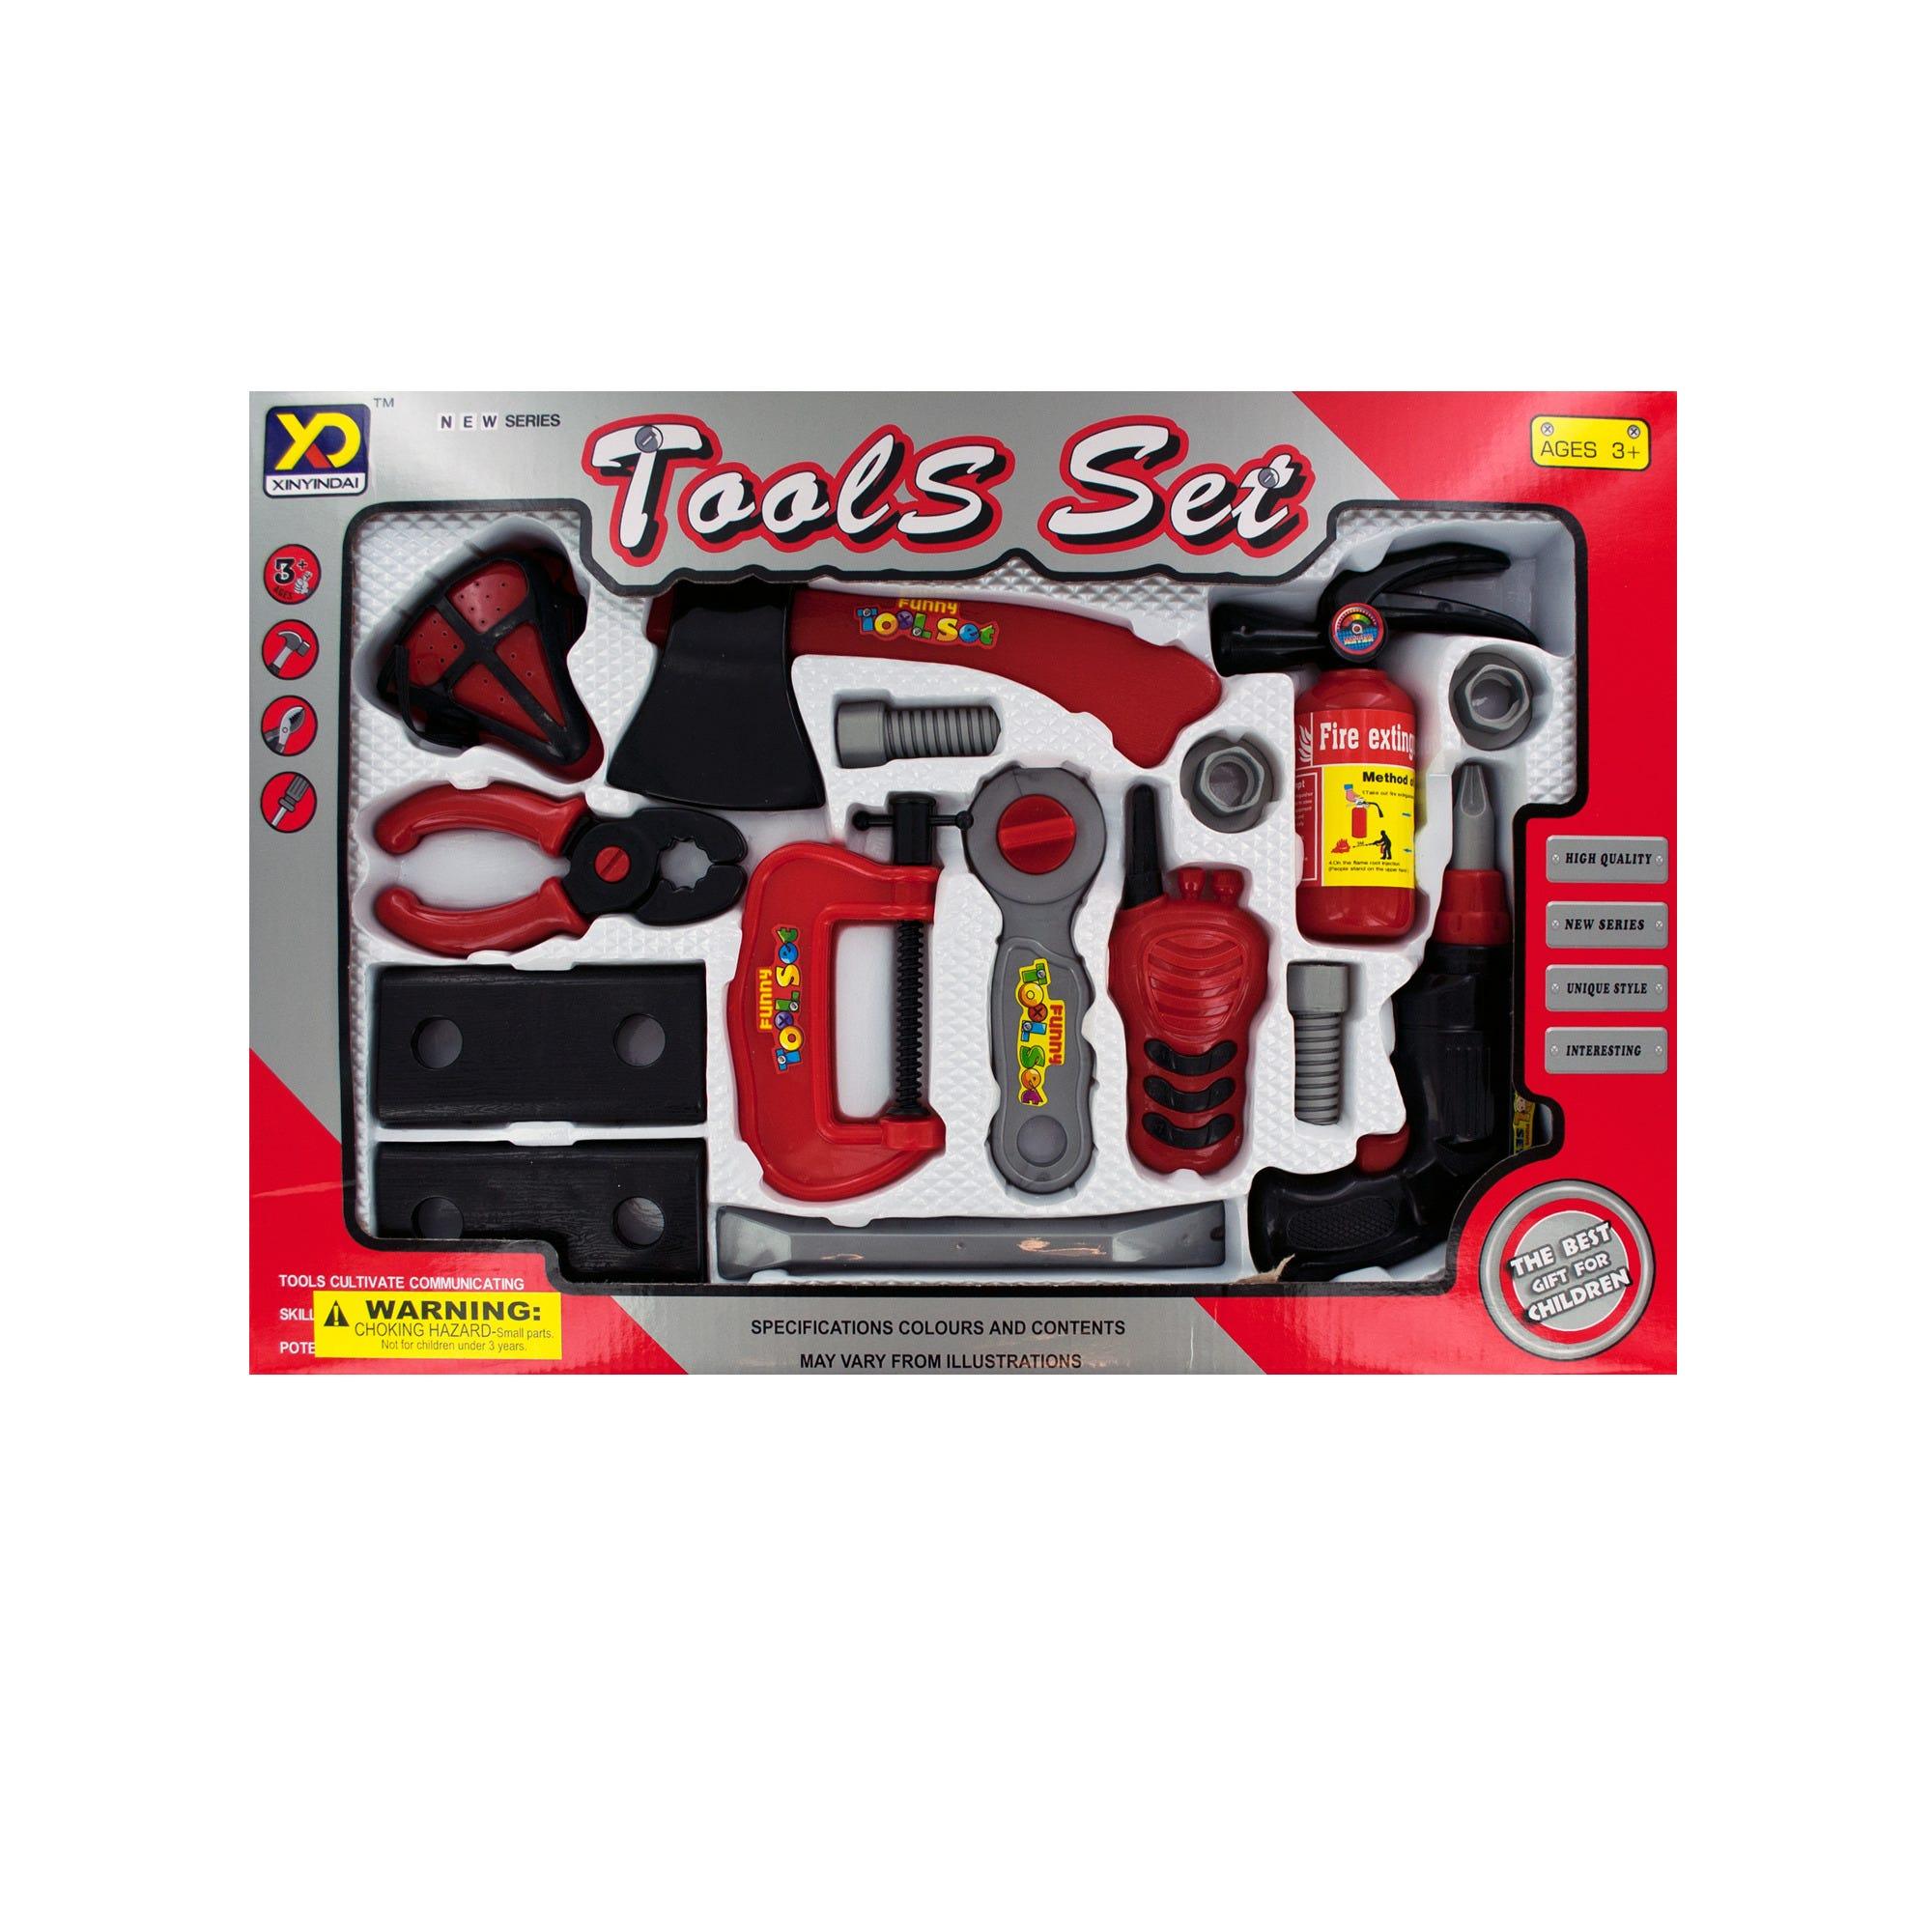 large-play-tool-set